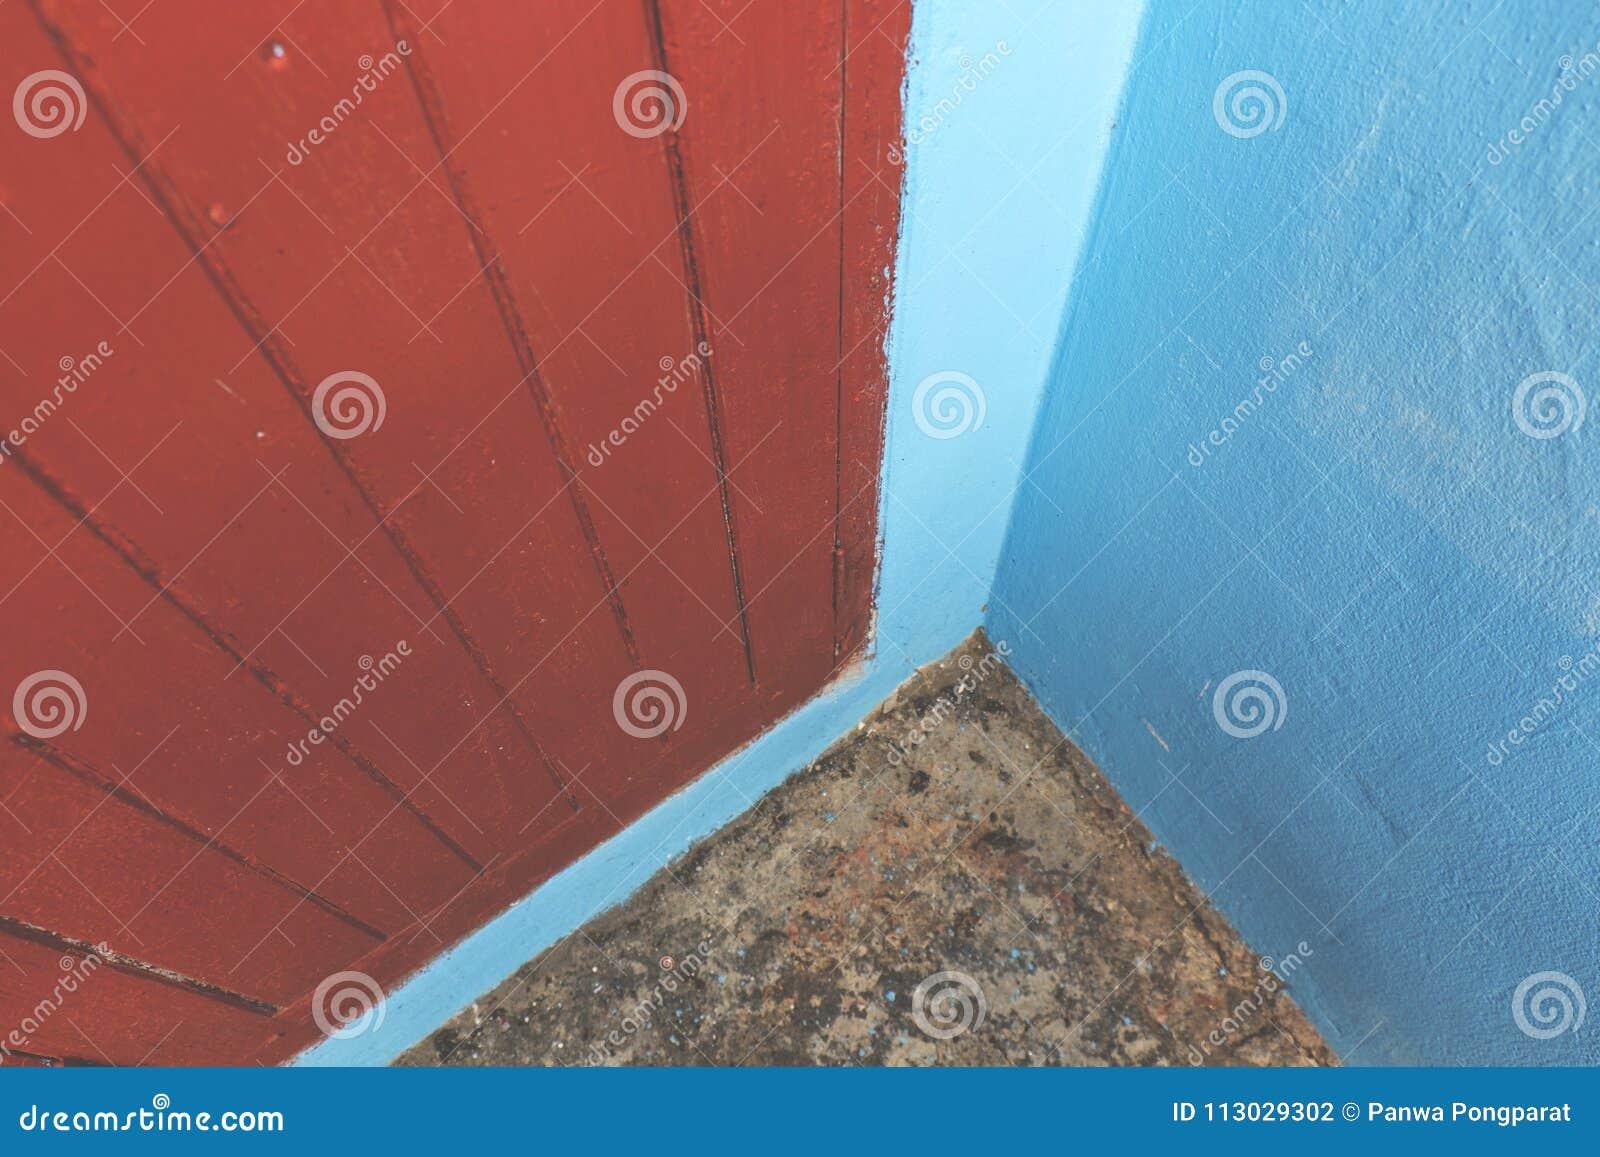 Esquina al aire libre azul y puerta roja